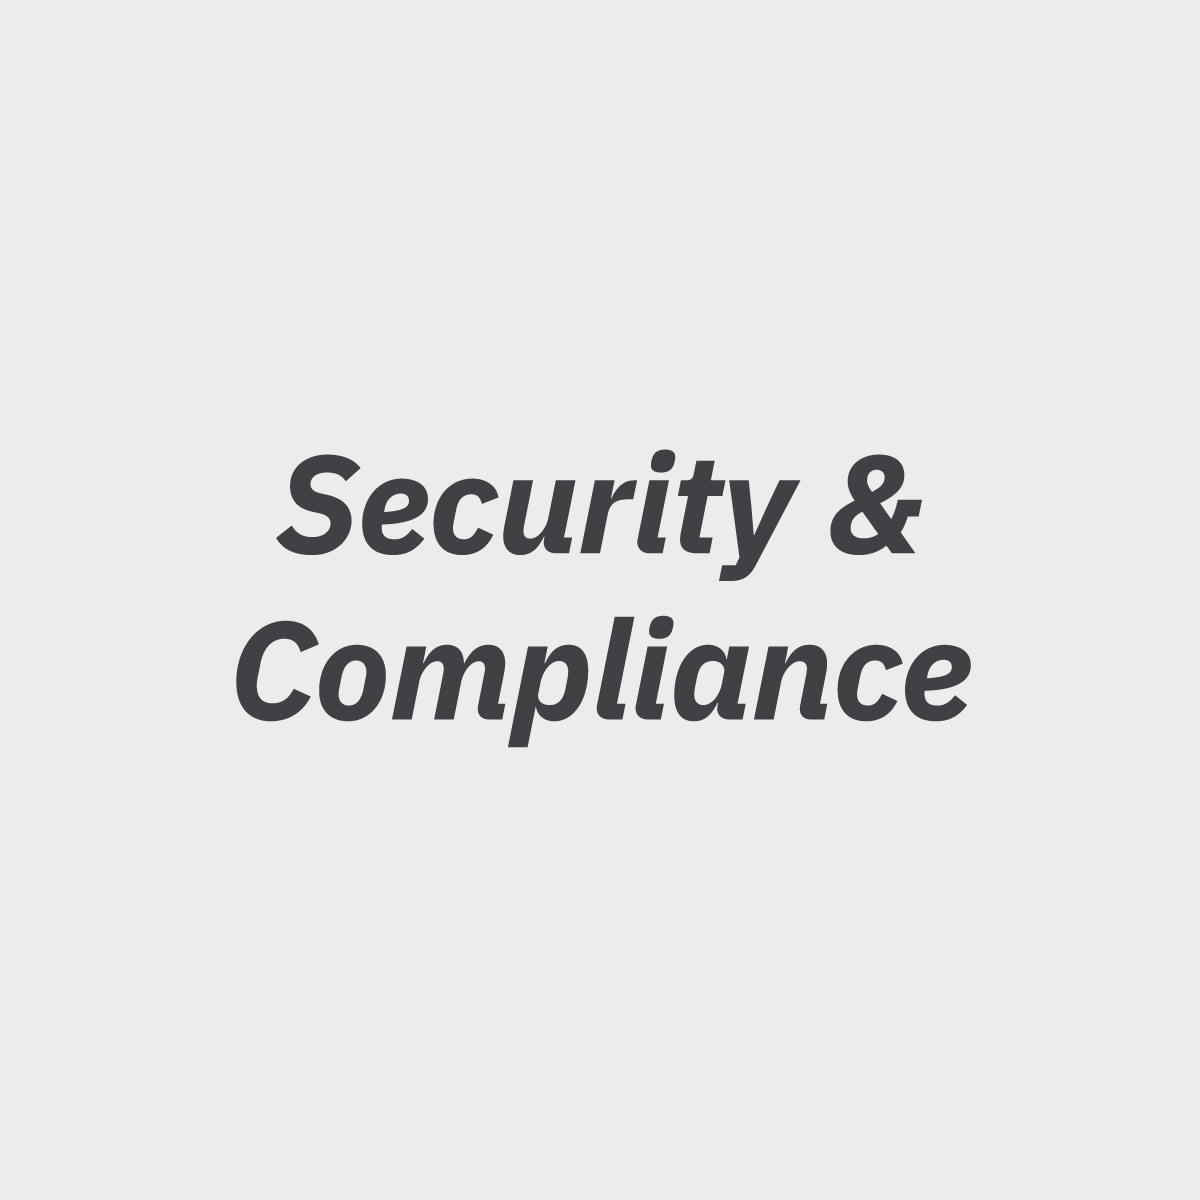 Get Dudley, Orlando, FL & New York, NY, Portfolio, Helene Dudley, Security & Compliance